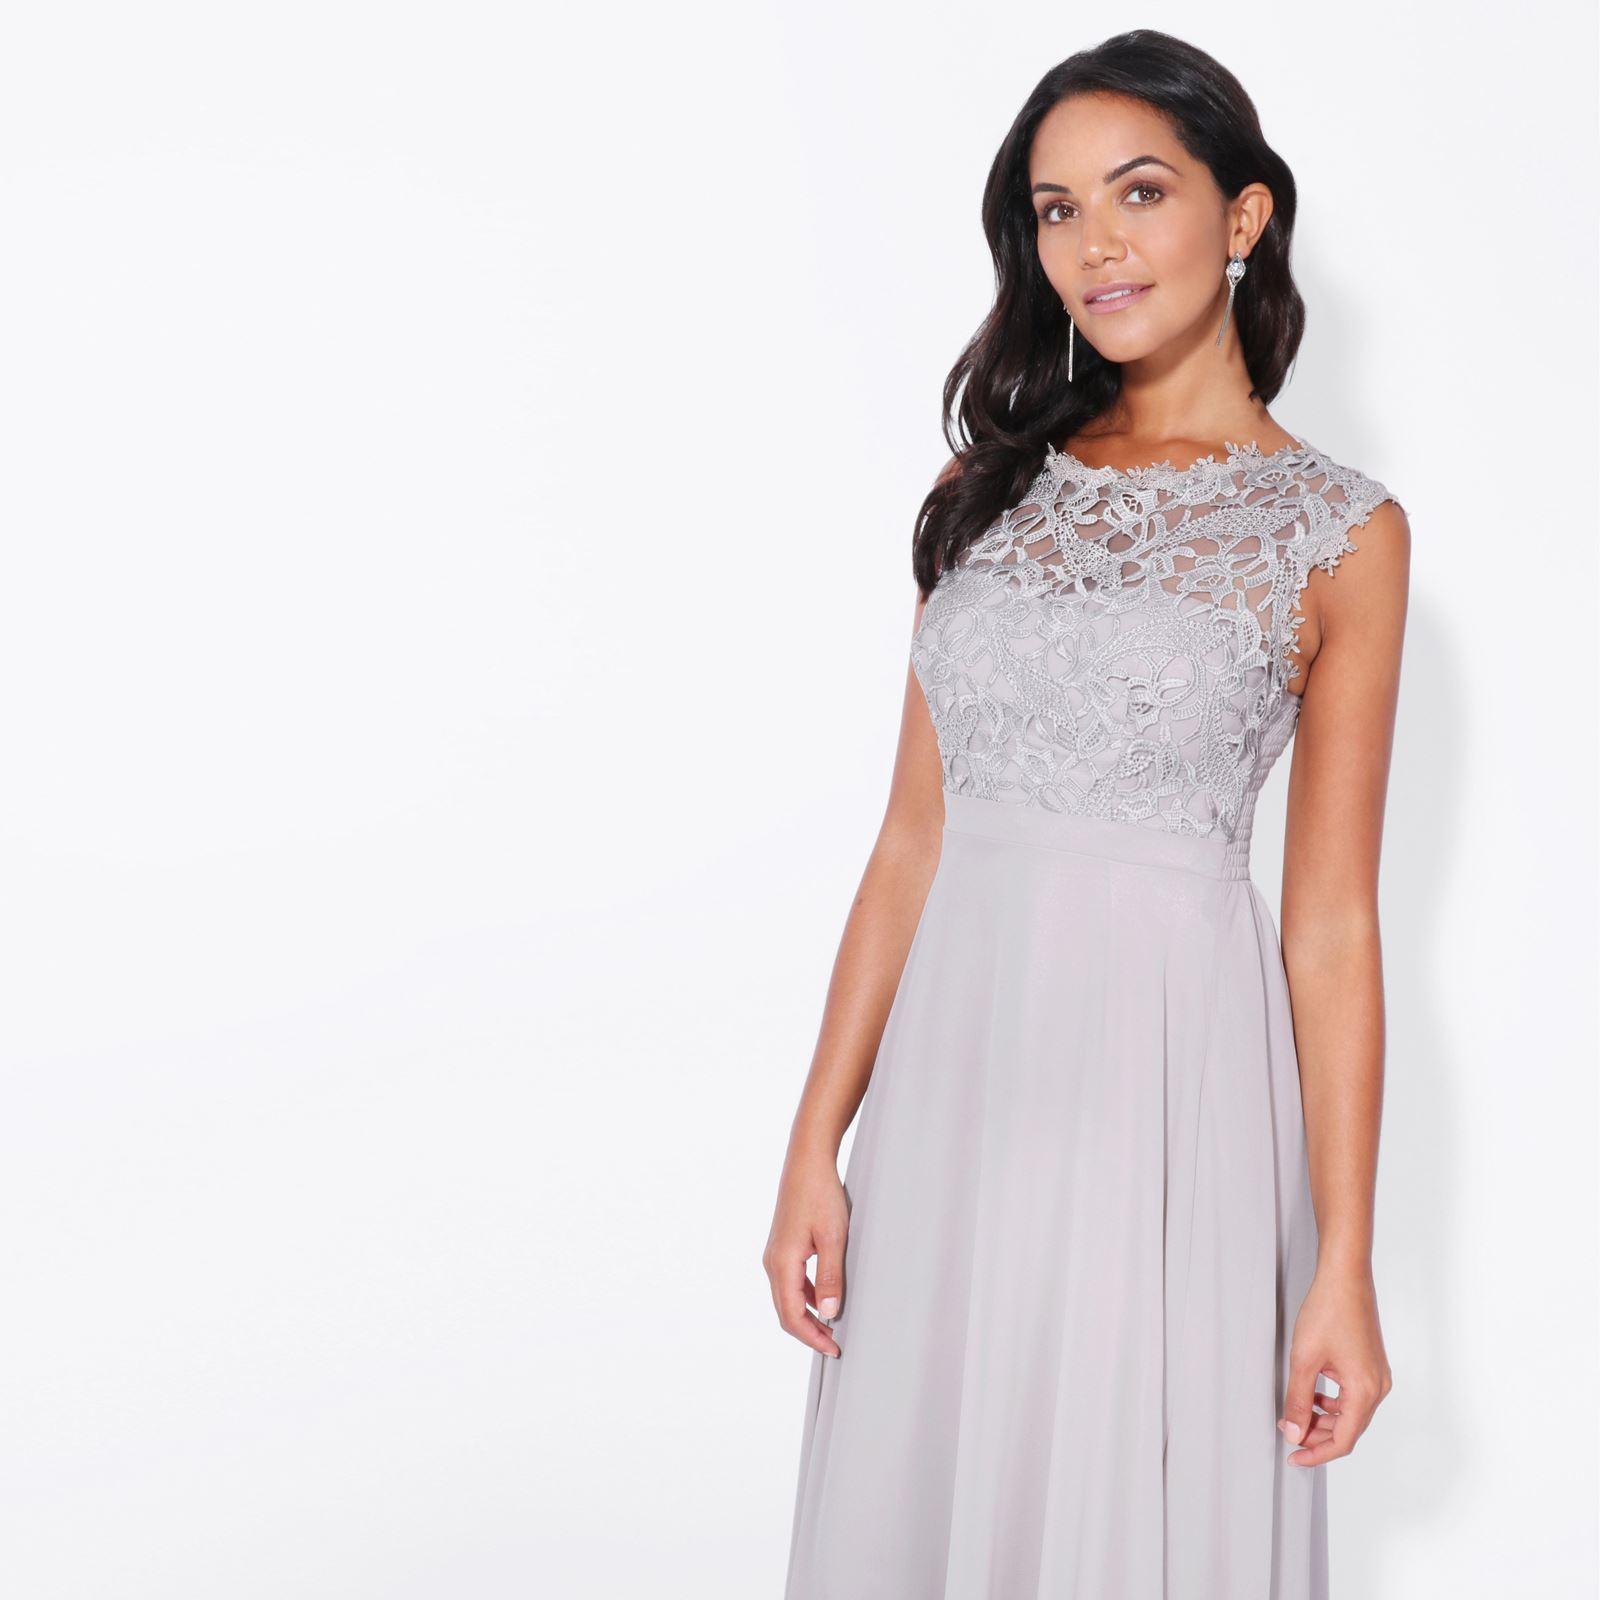 Womens-Wedding-Bridesmaid-Prom-Dress-Formal-One-Off-Shoulder-Long-Evening-8-18 thumbnail 28